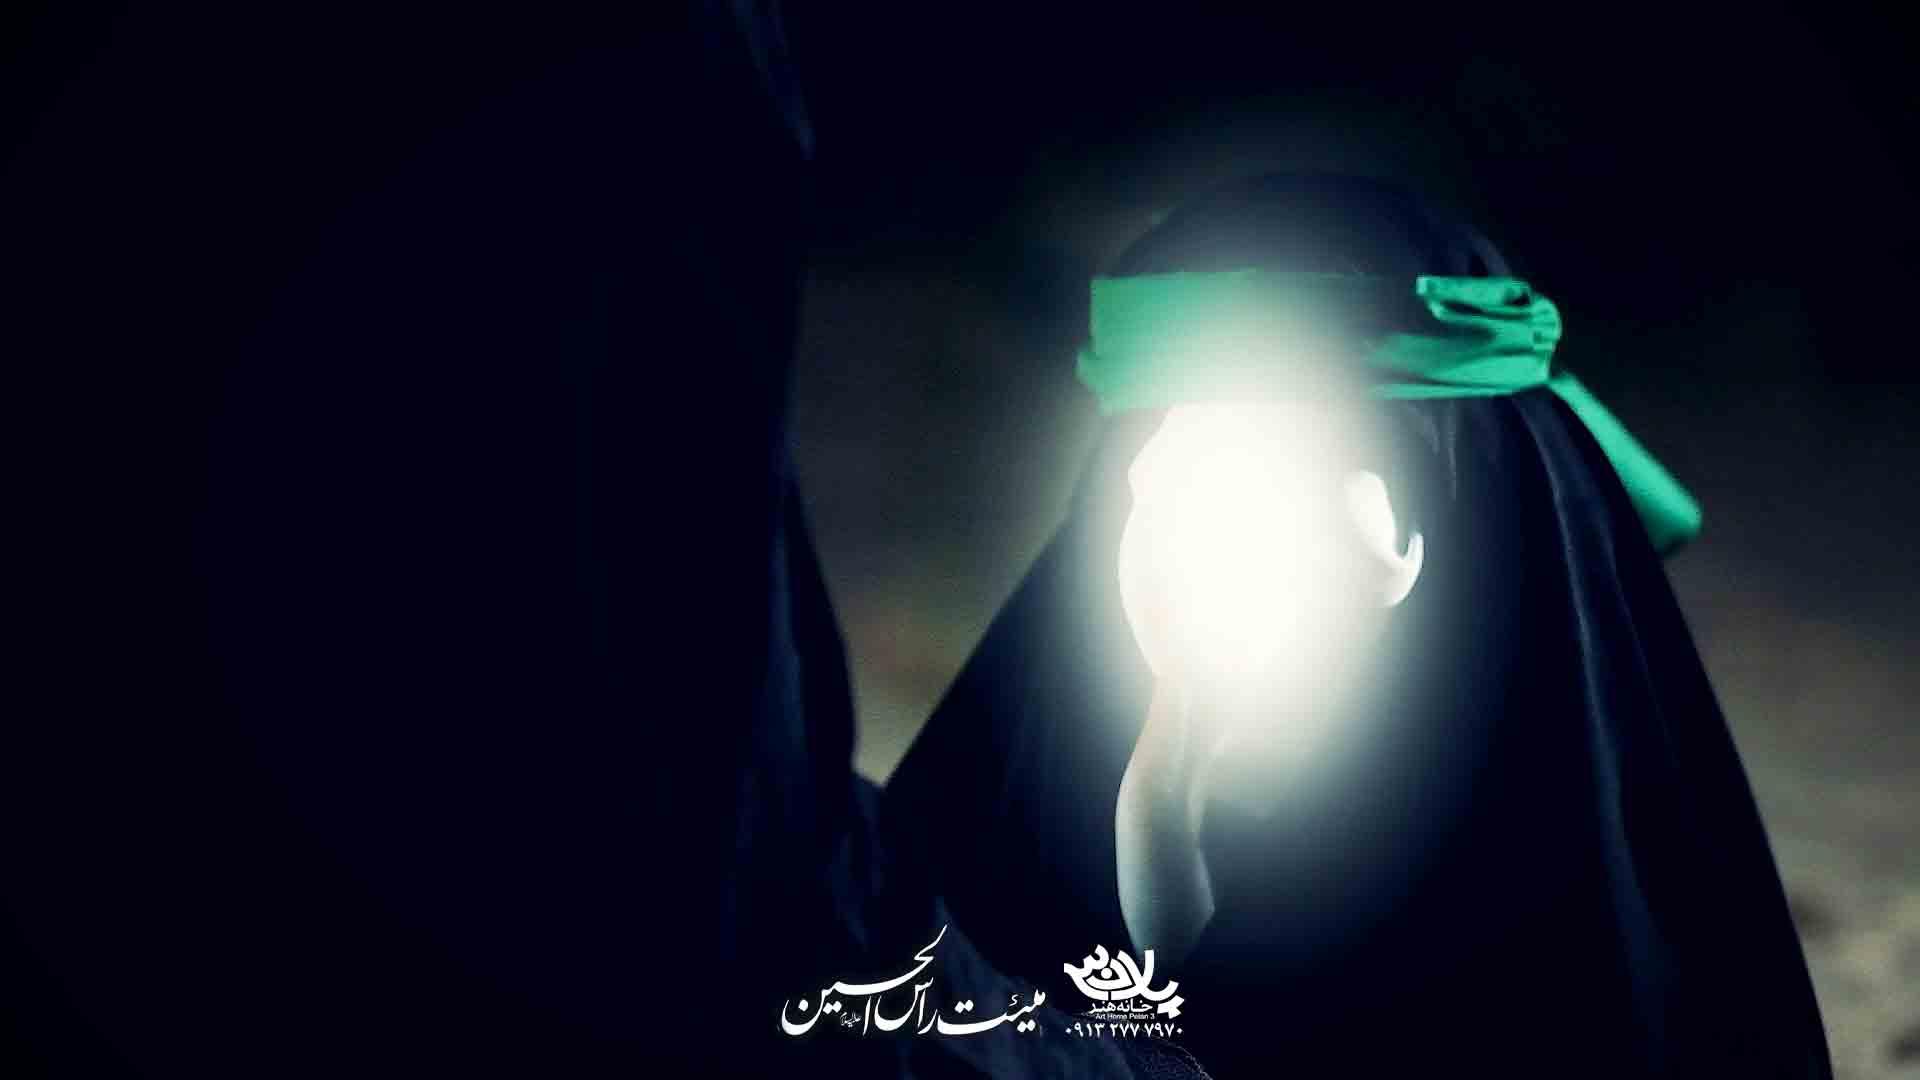 شرح قصه حیدر خمسه